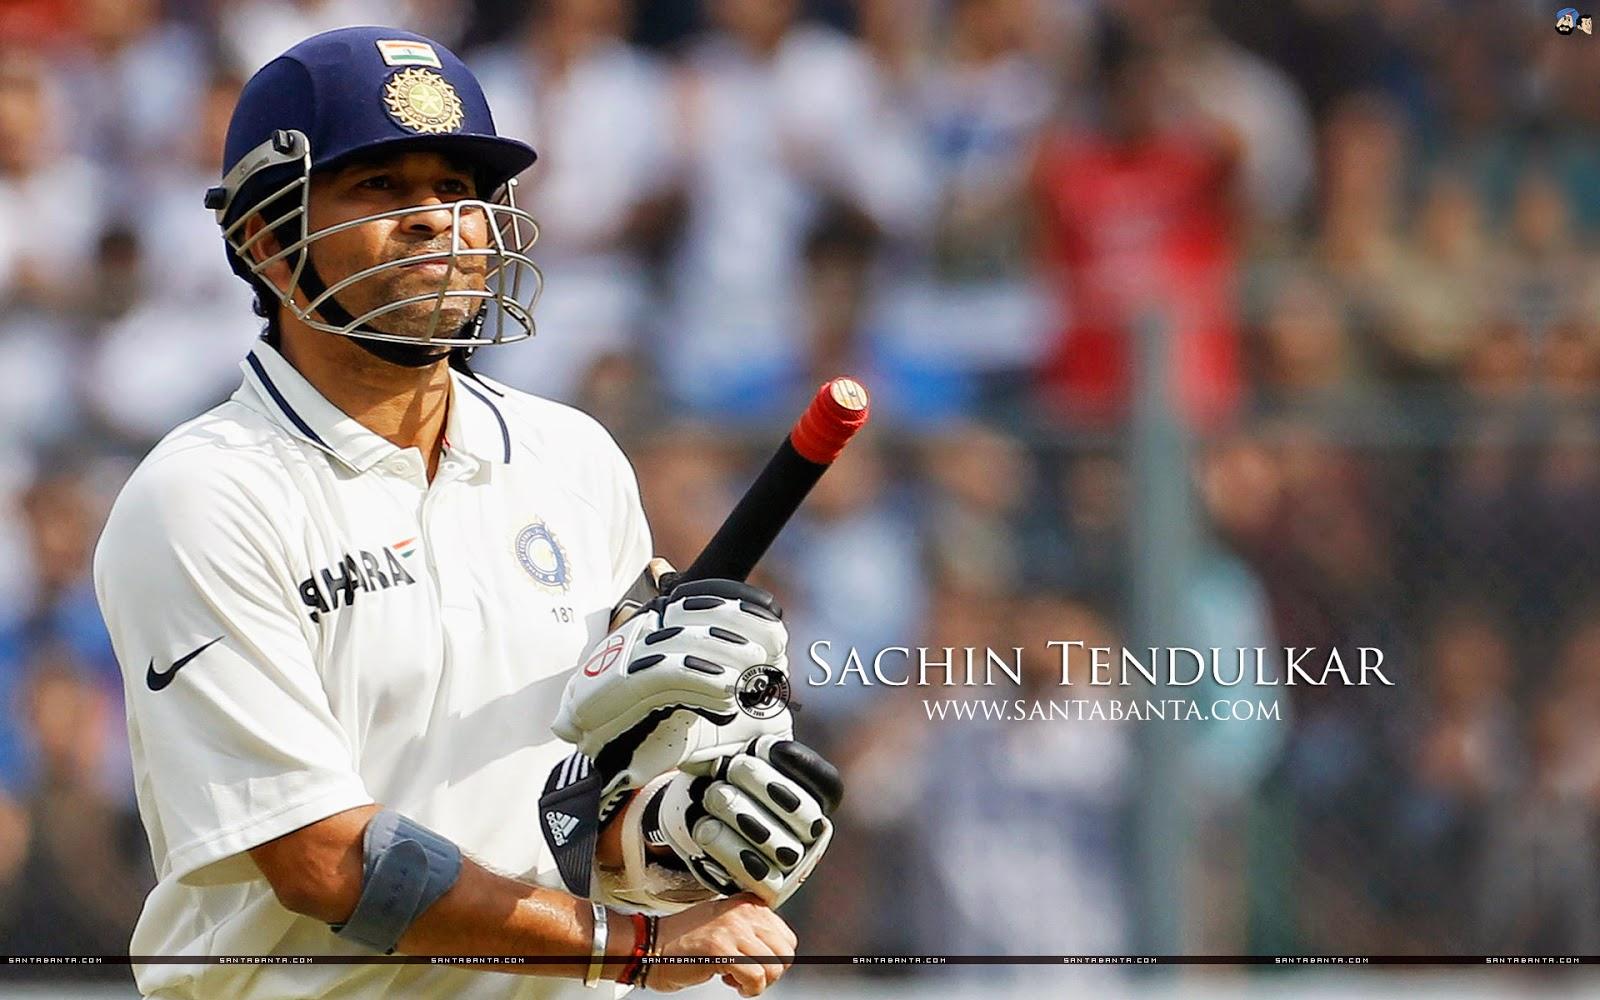 Sachin Tendulkar New 2014 HD Wallpapers and IPL 2014 HD ... Sachin Tendulkar Wallpapers Hd